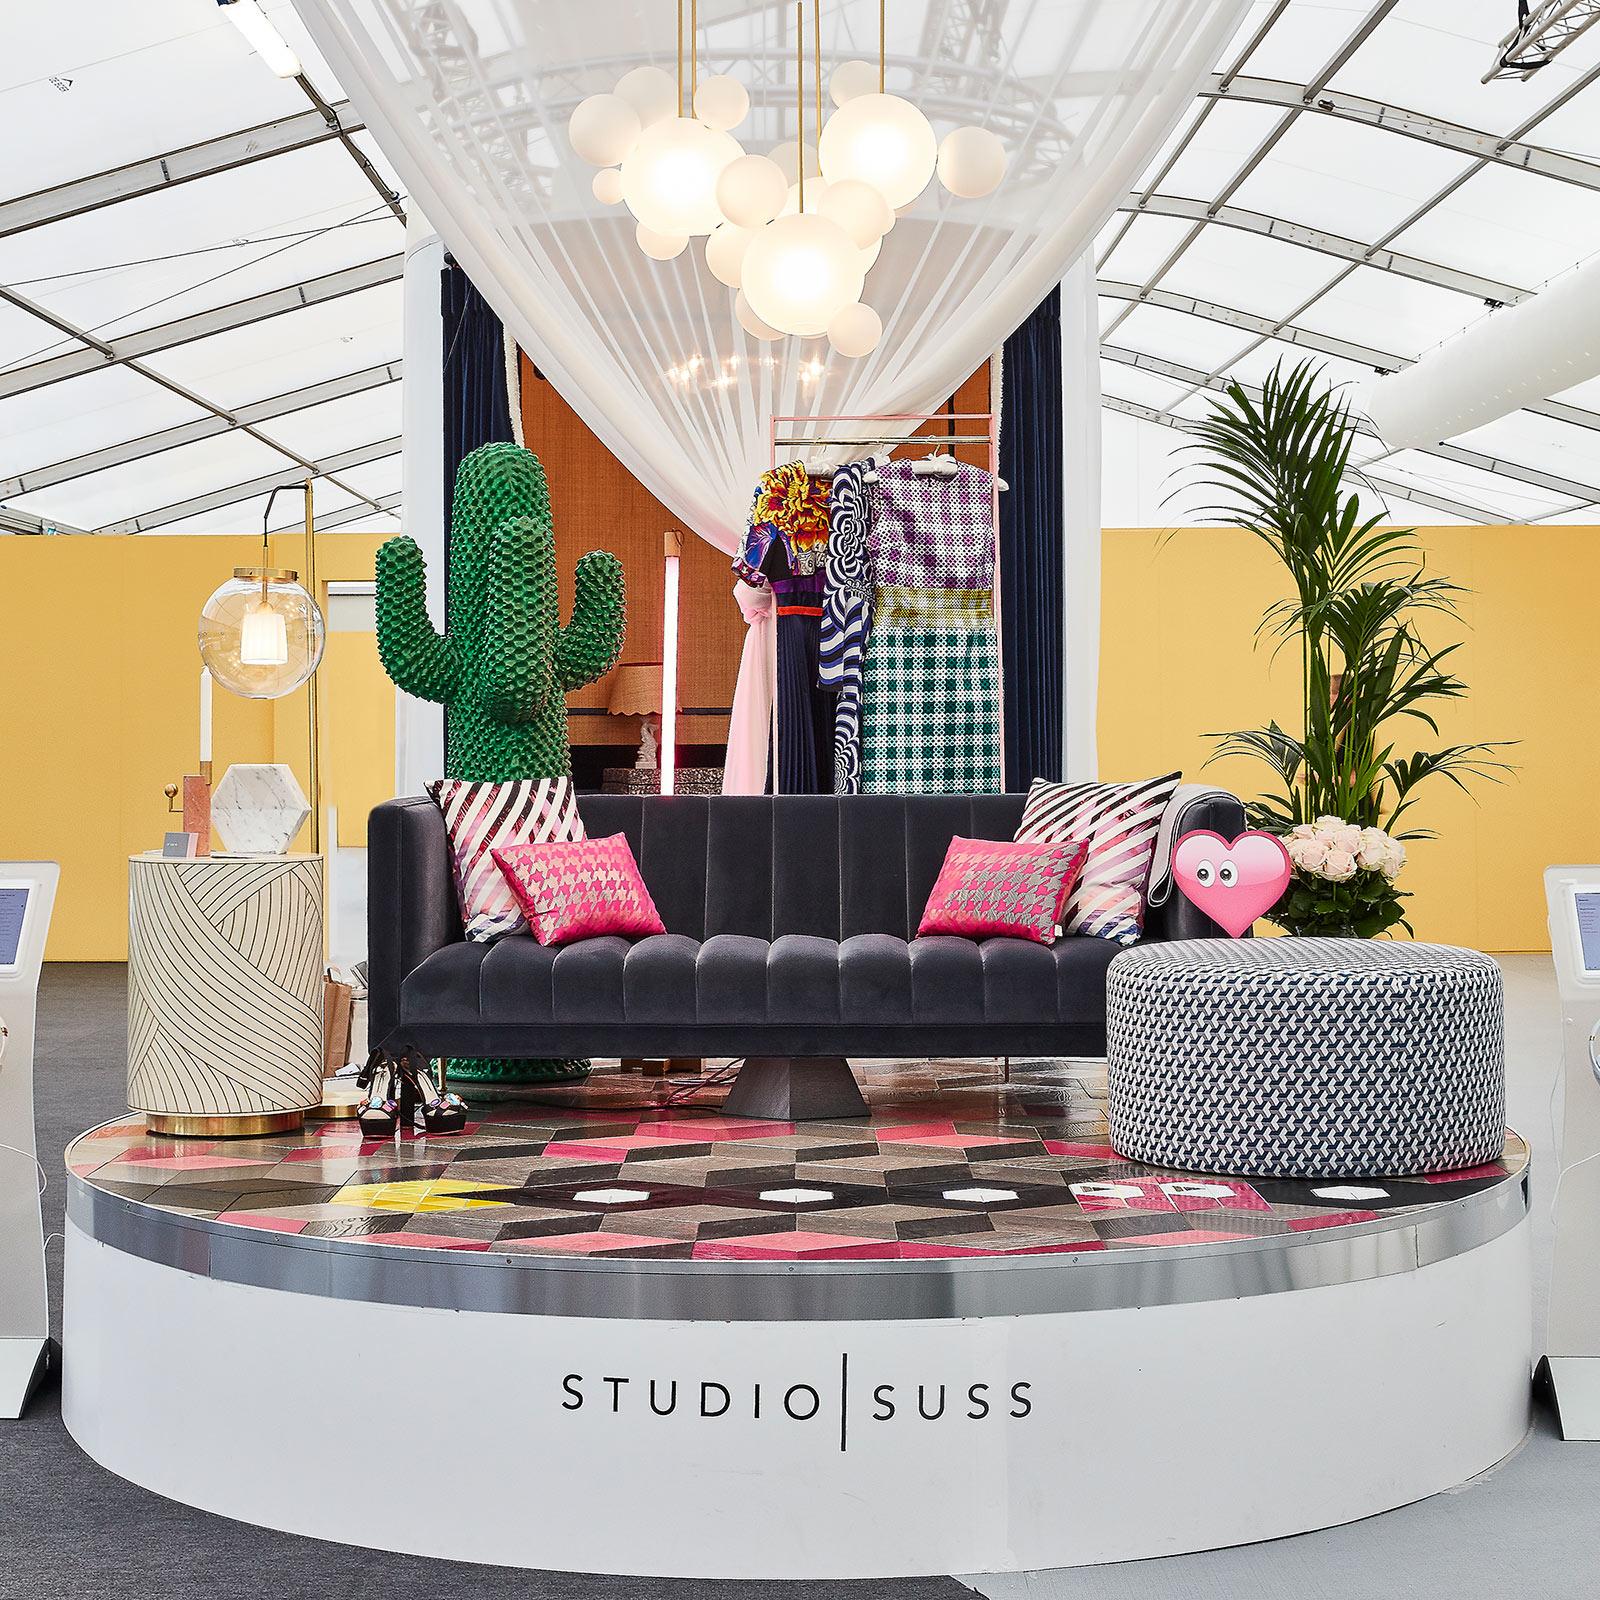 Full entrance way interior design exhibition for Decorex 2018 by Studio Suss